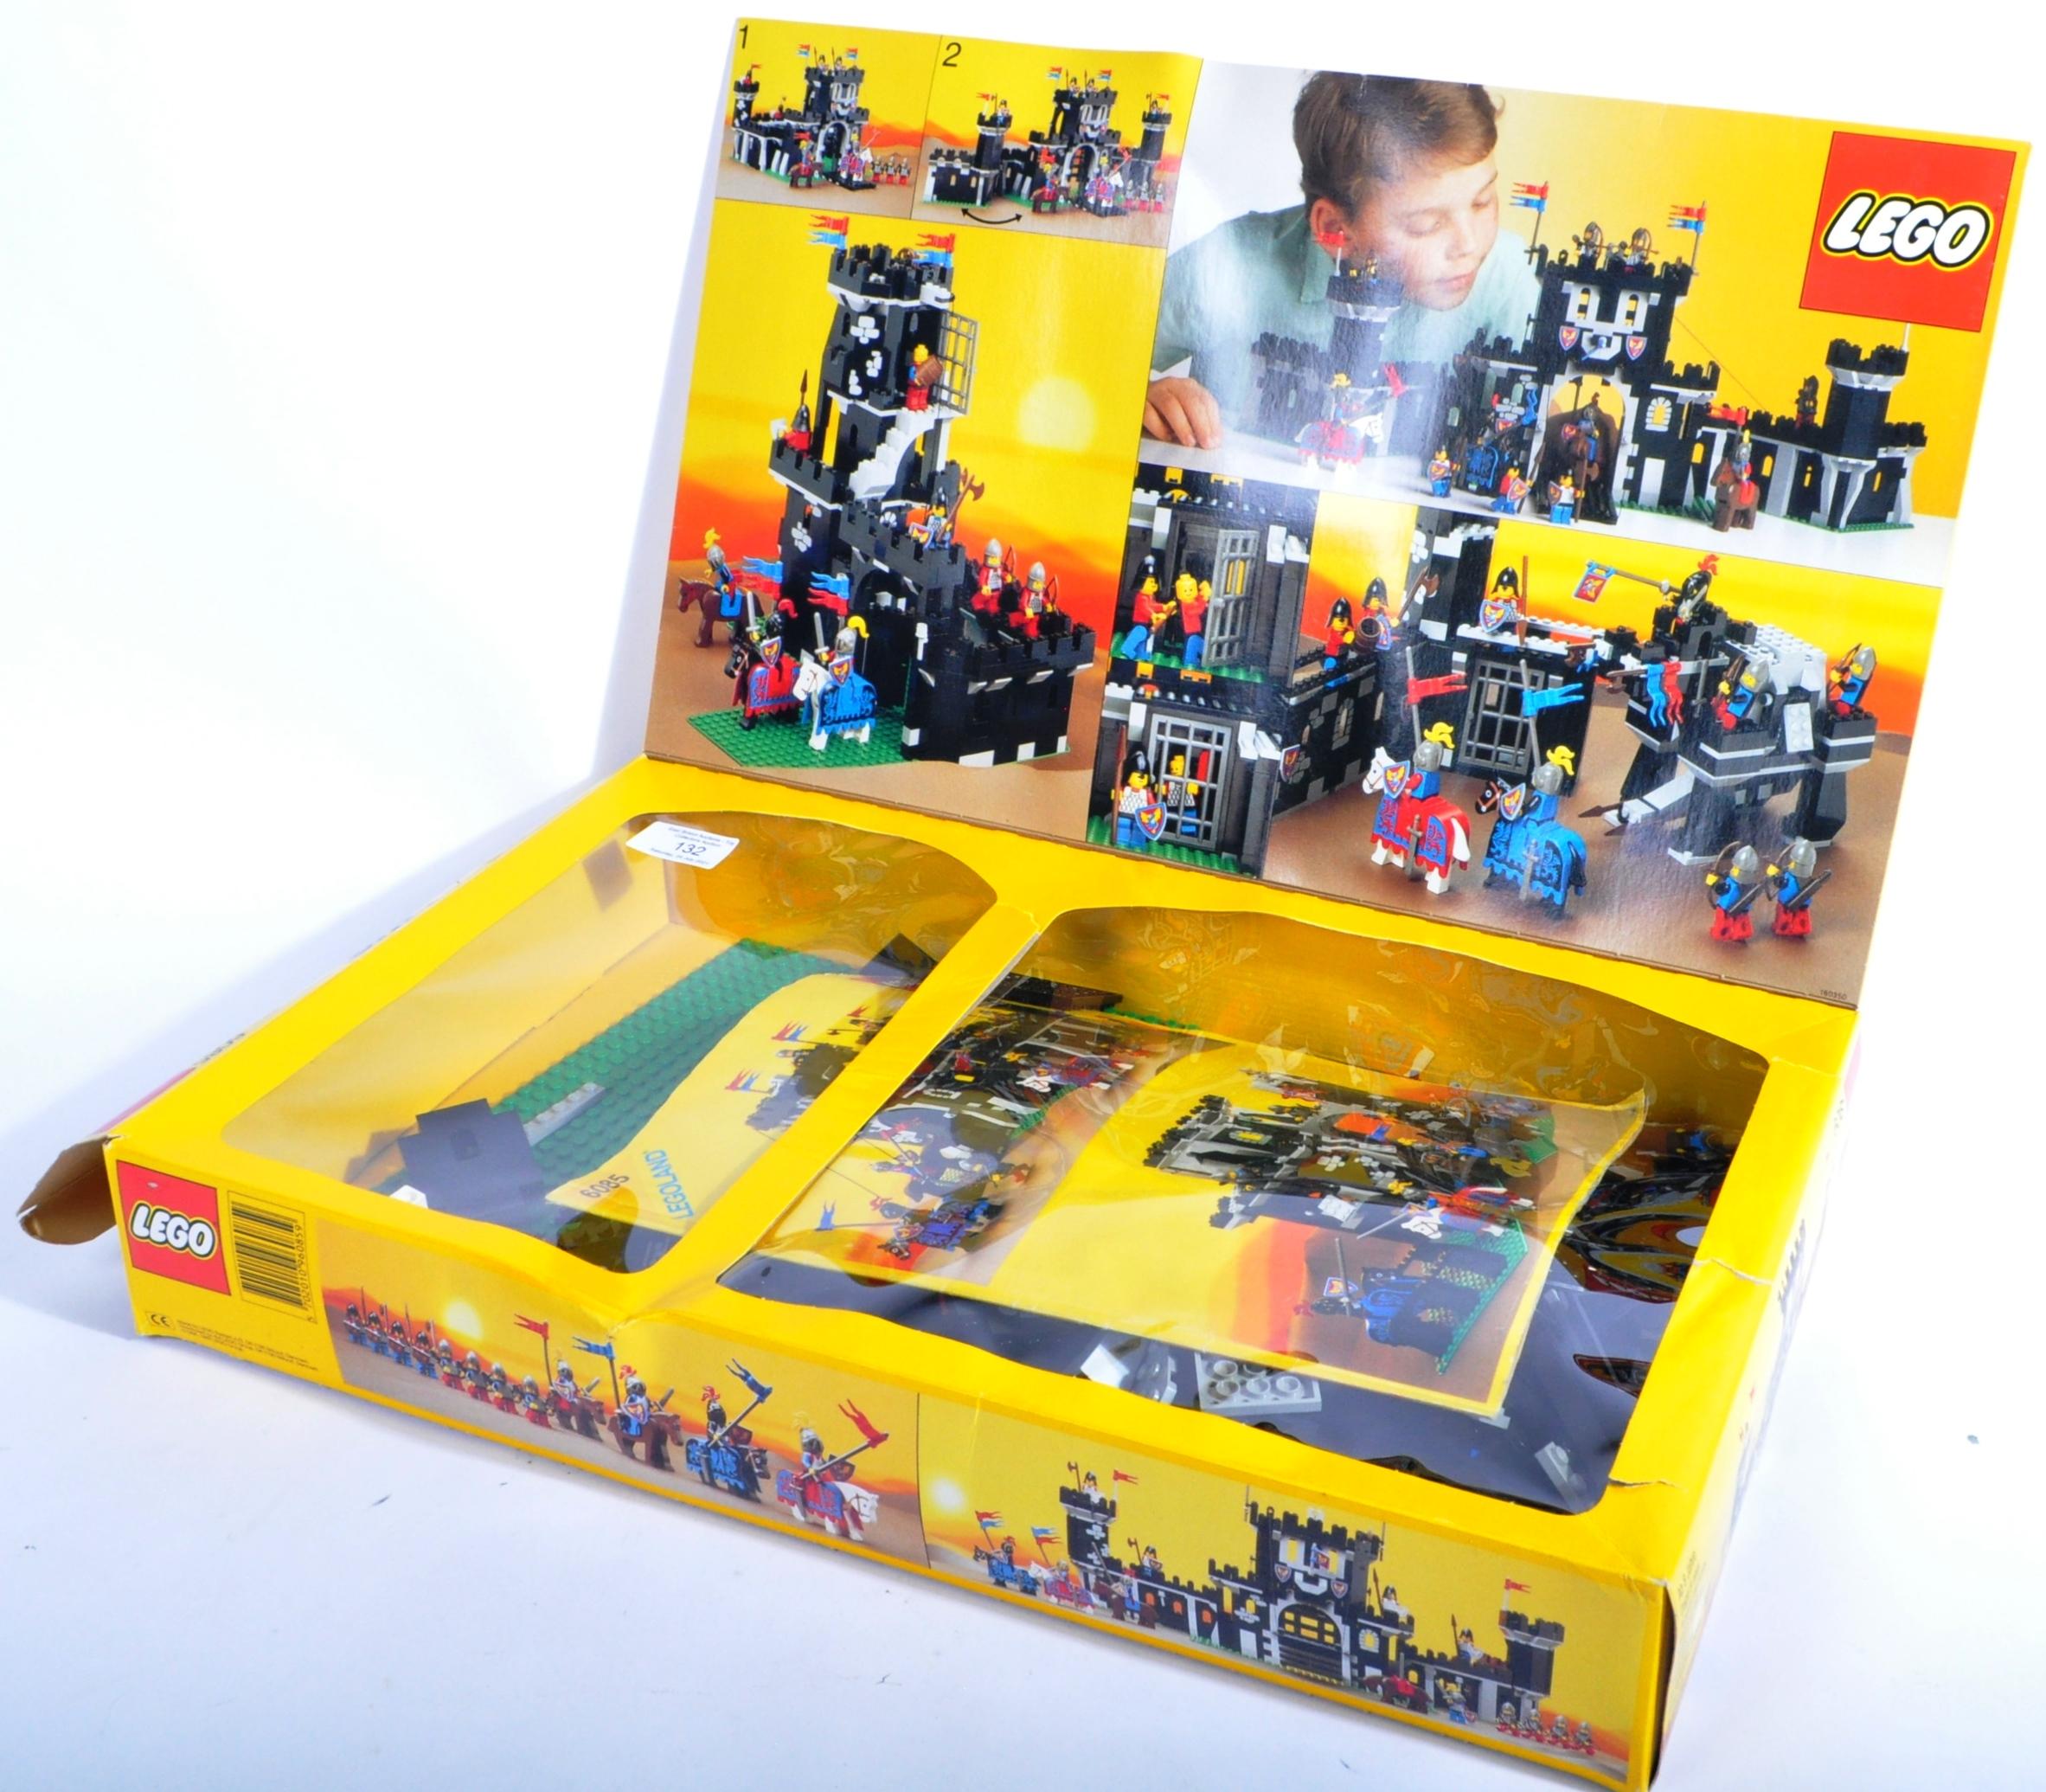 LEGO SET - LEGO LAND - 6085 - BLACK MONARCH'S CASTLE - Image 3 of 4